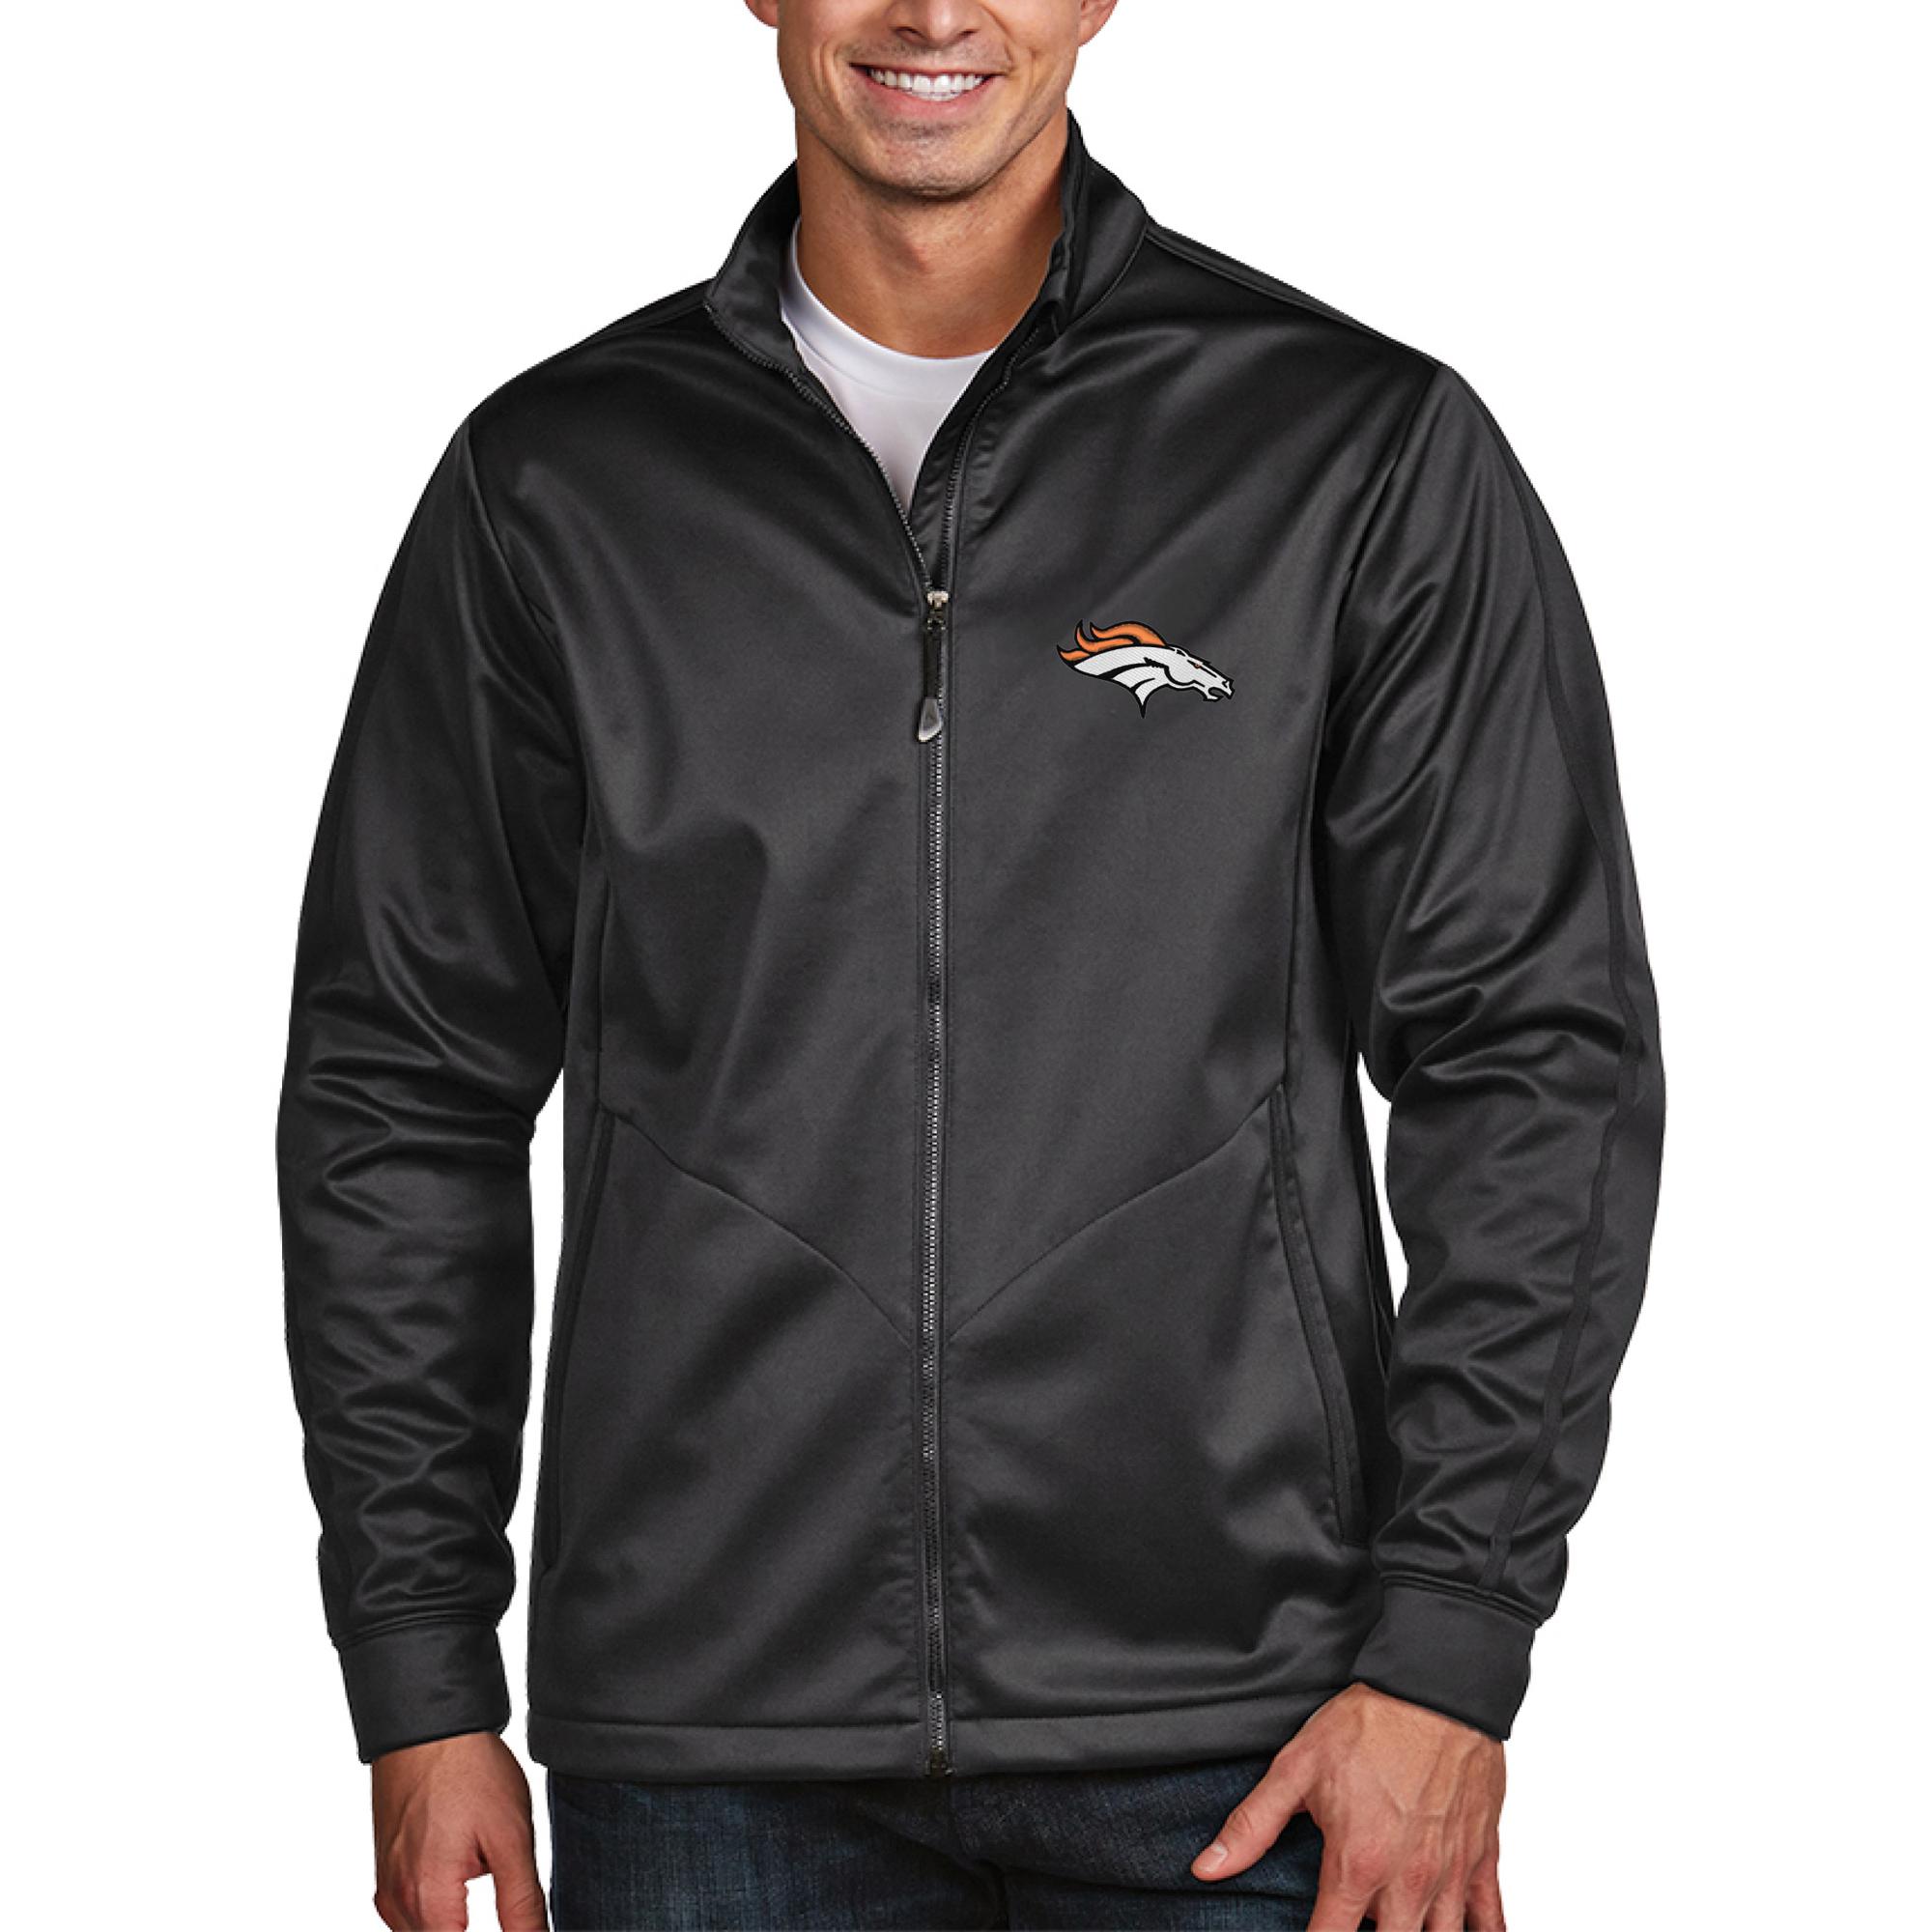 Denver Broncos Antigua Golf Full-Zip Jacket - Charcoal